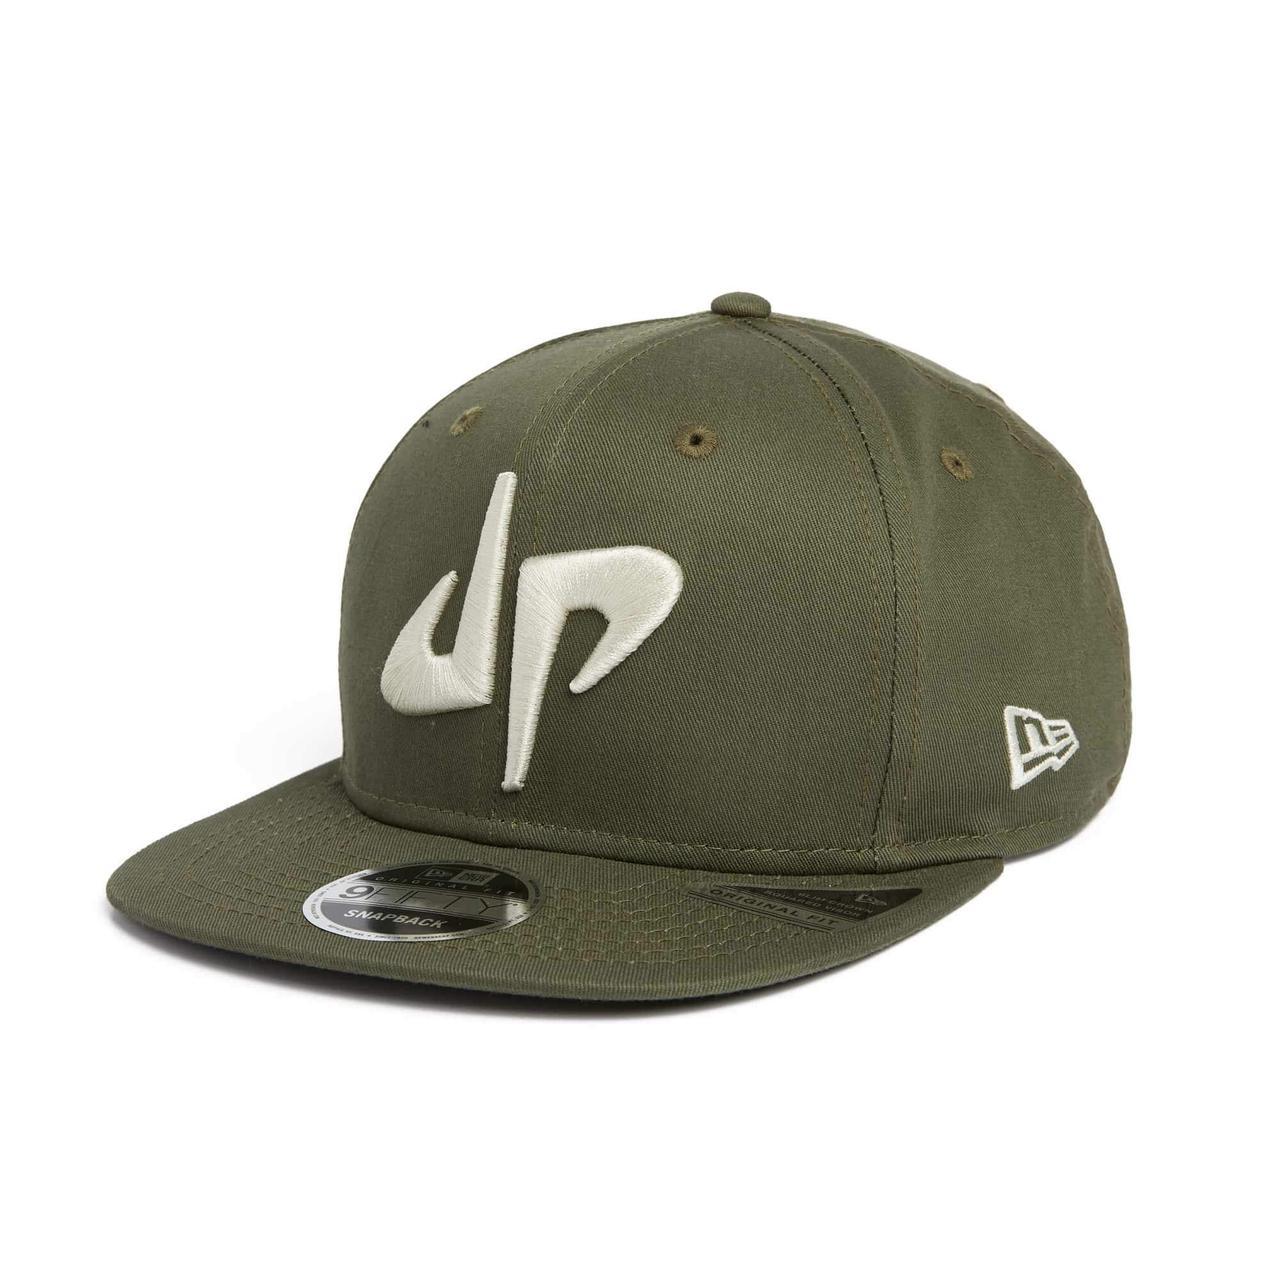 28bde183091dd Dude Perfect DP x New Era 9Fifty Snapback    OD Green